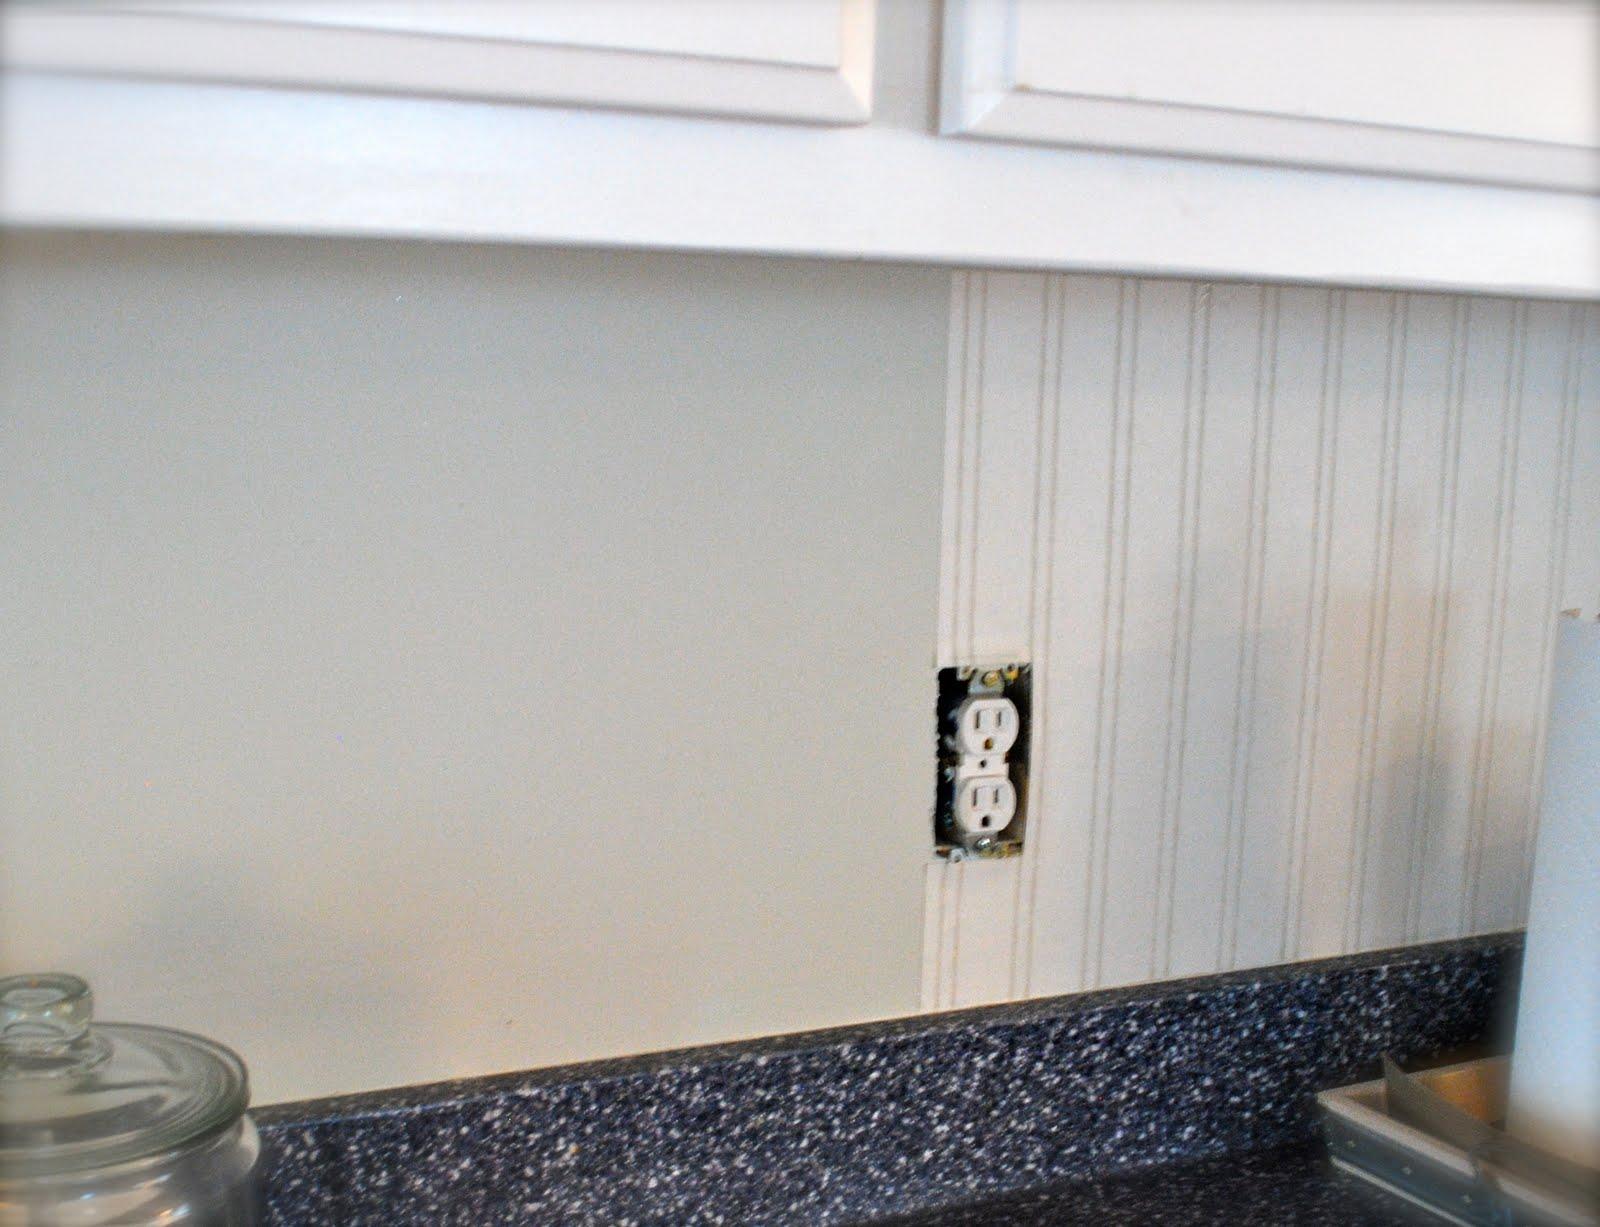 Kitchen Wallpaper Backsplash 5 Decor Ideas - EnhancedHomes.org